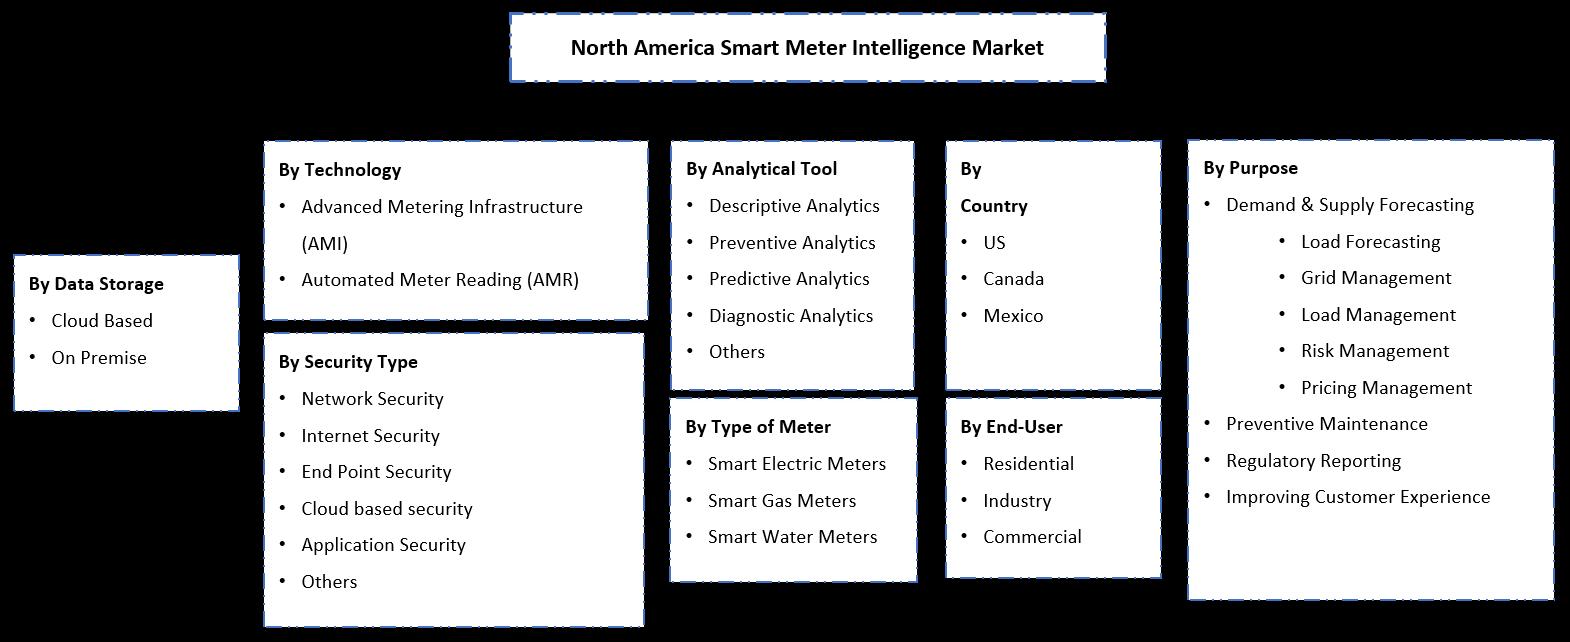 North America Smart Meter Intelligence Market Segmentation